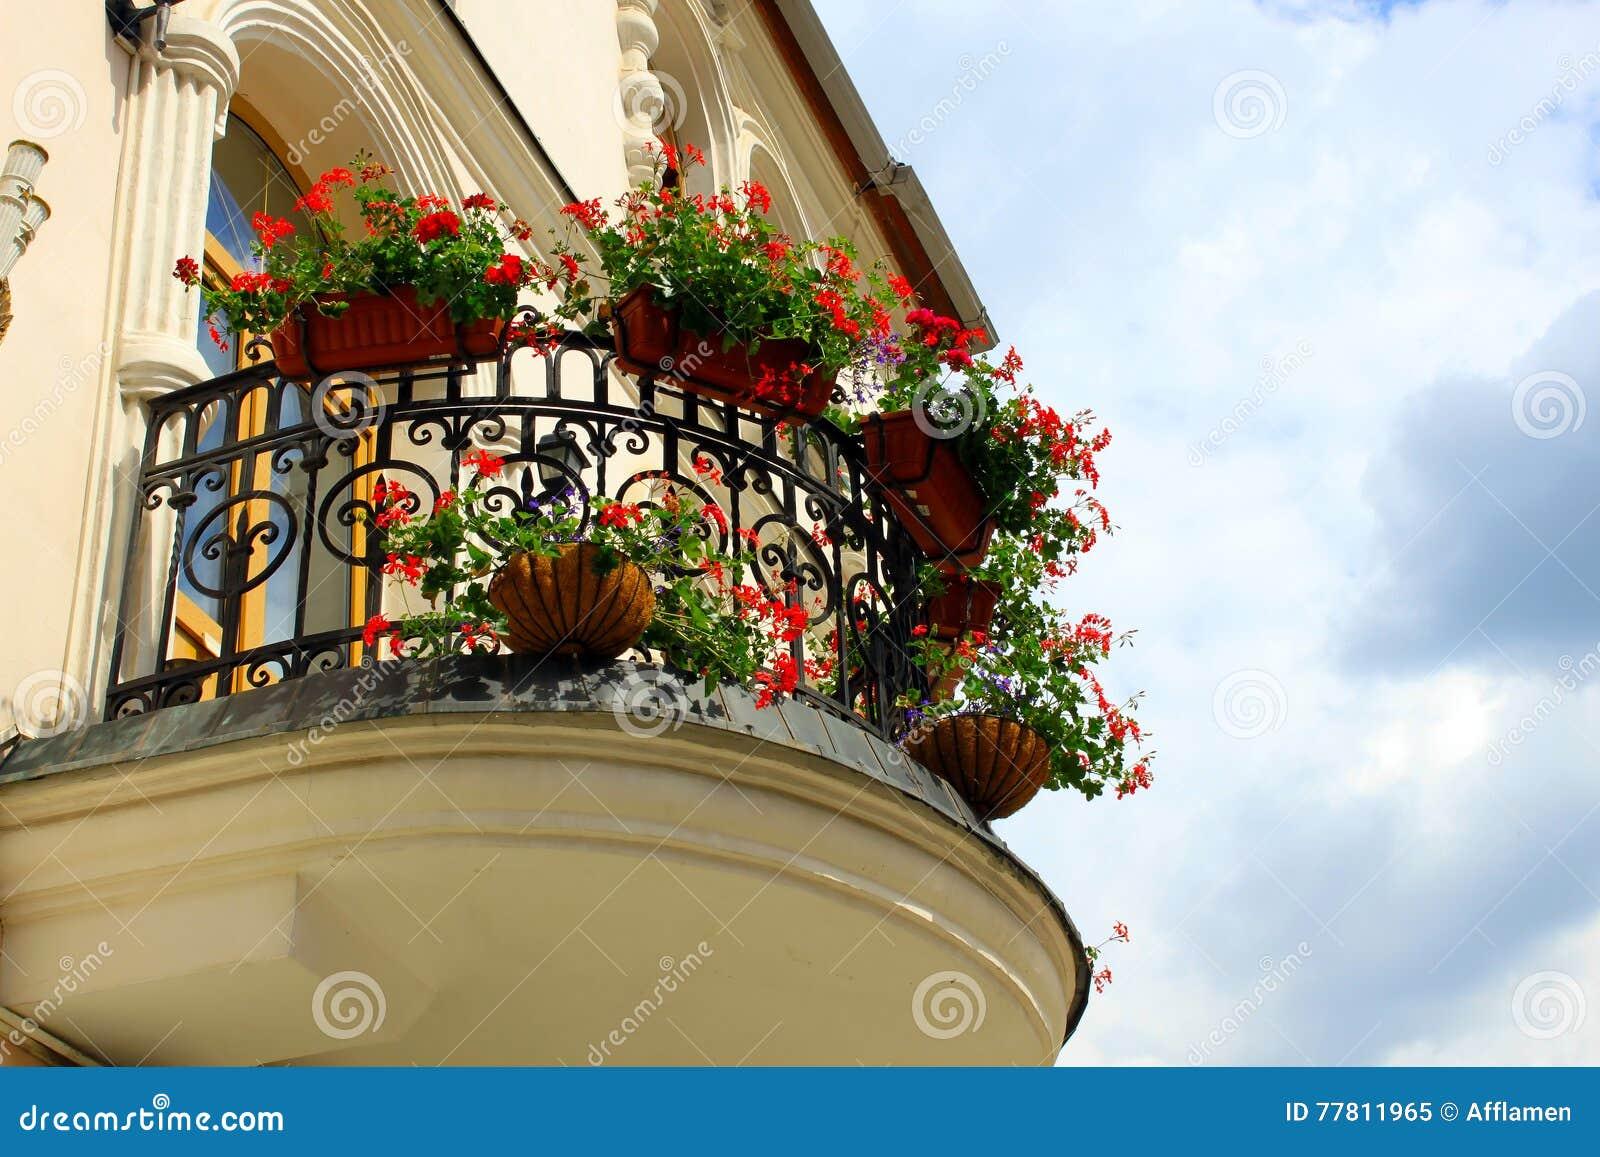 Balkon blumentopfe for Blumentopfe balkon